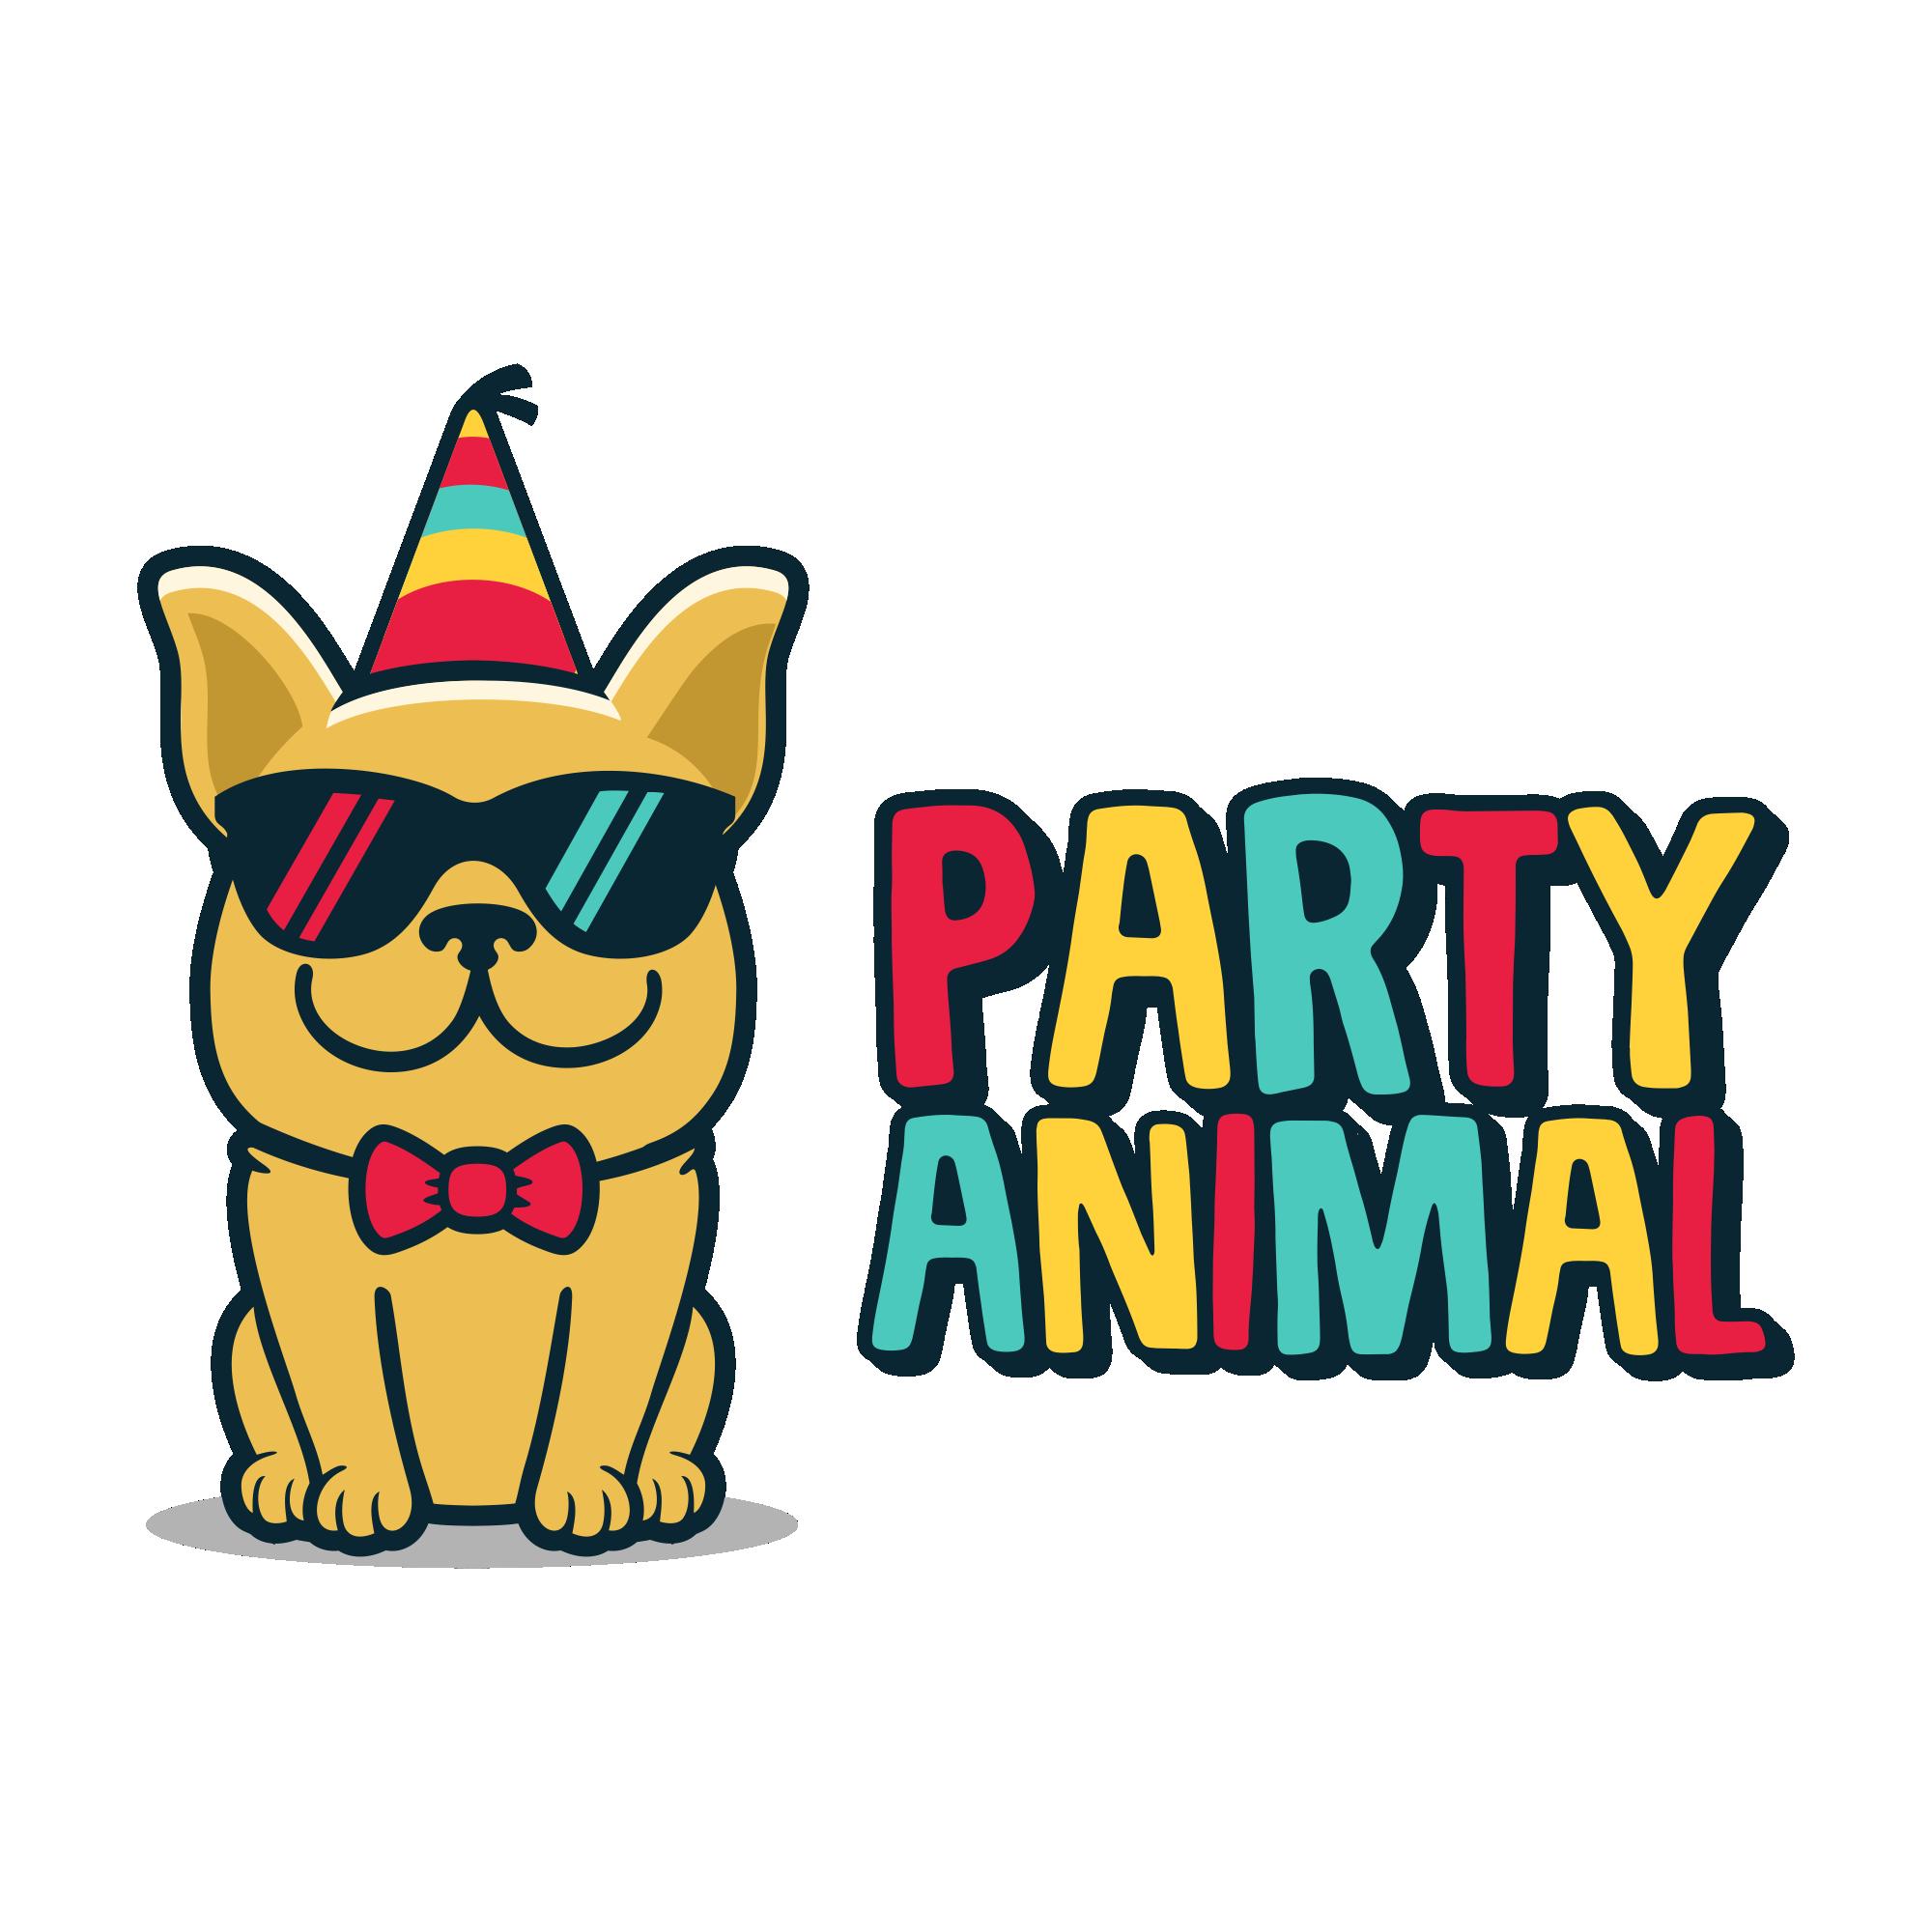 Design a hip, cool logo for Party Animal